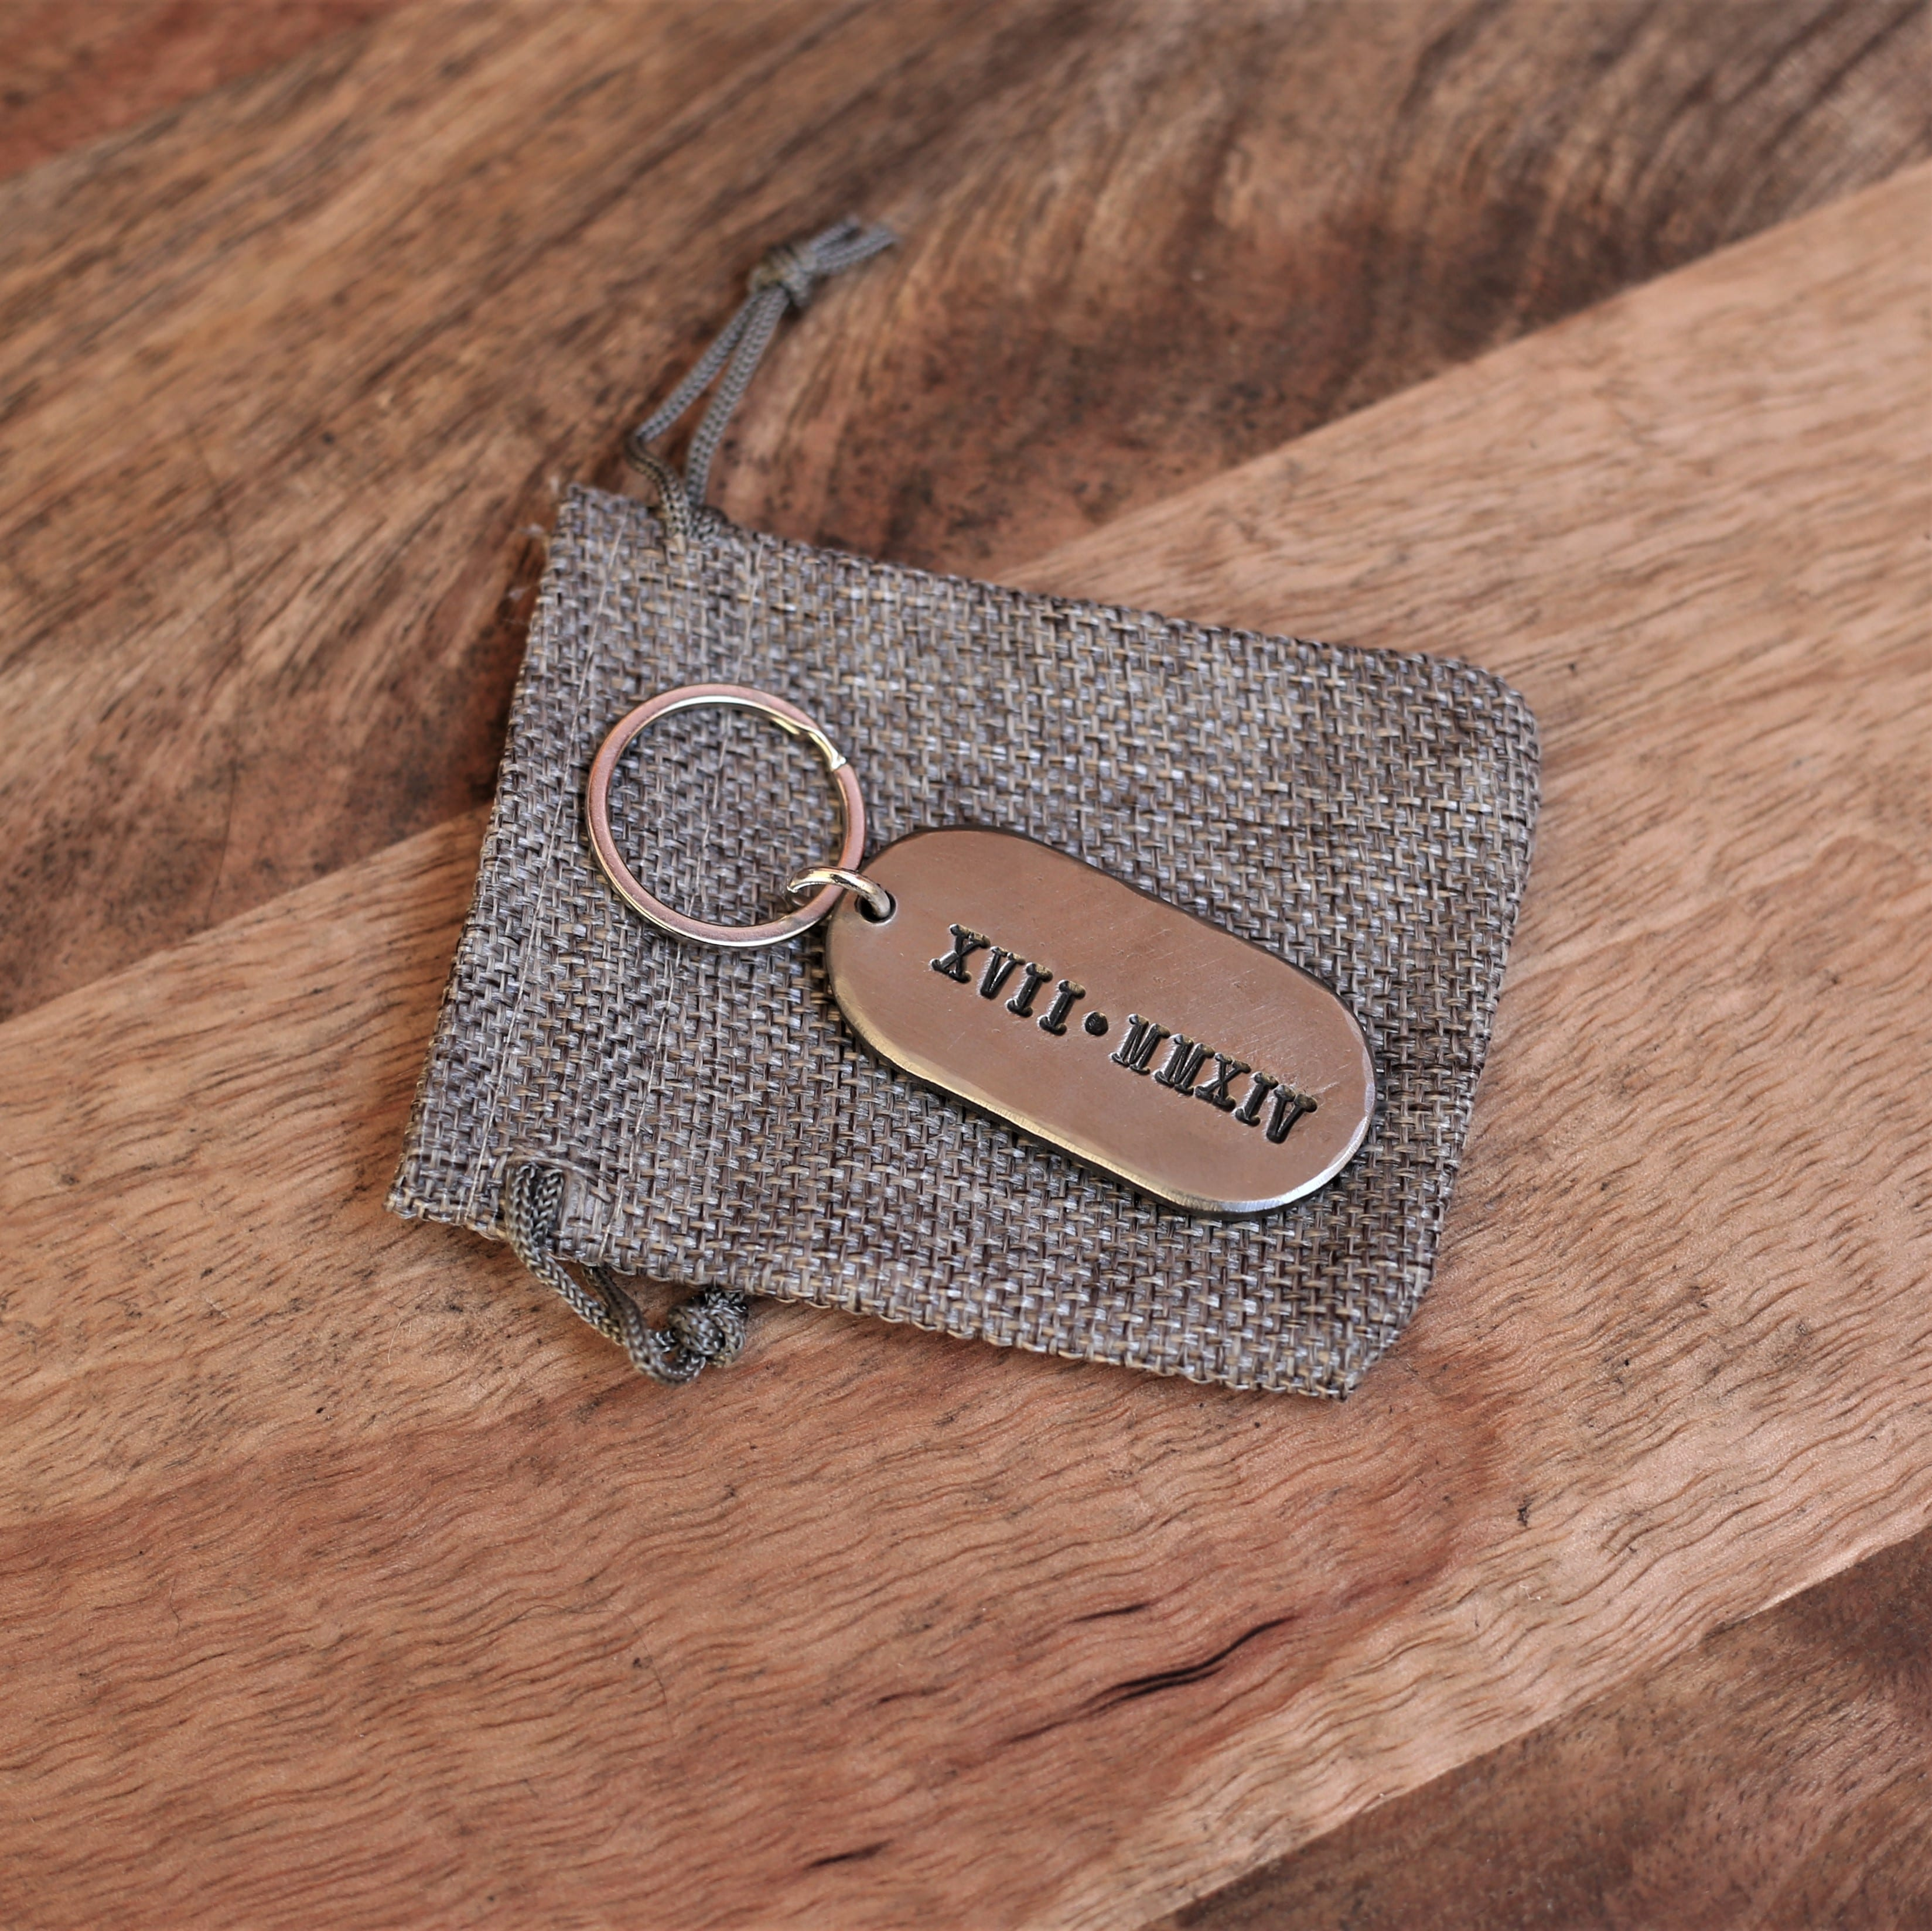 Key Ring packaging